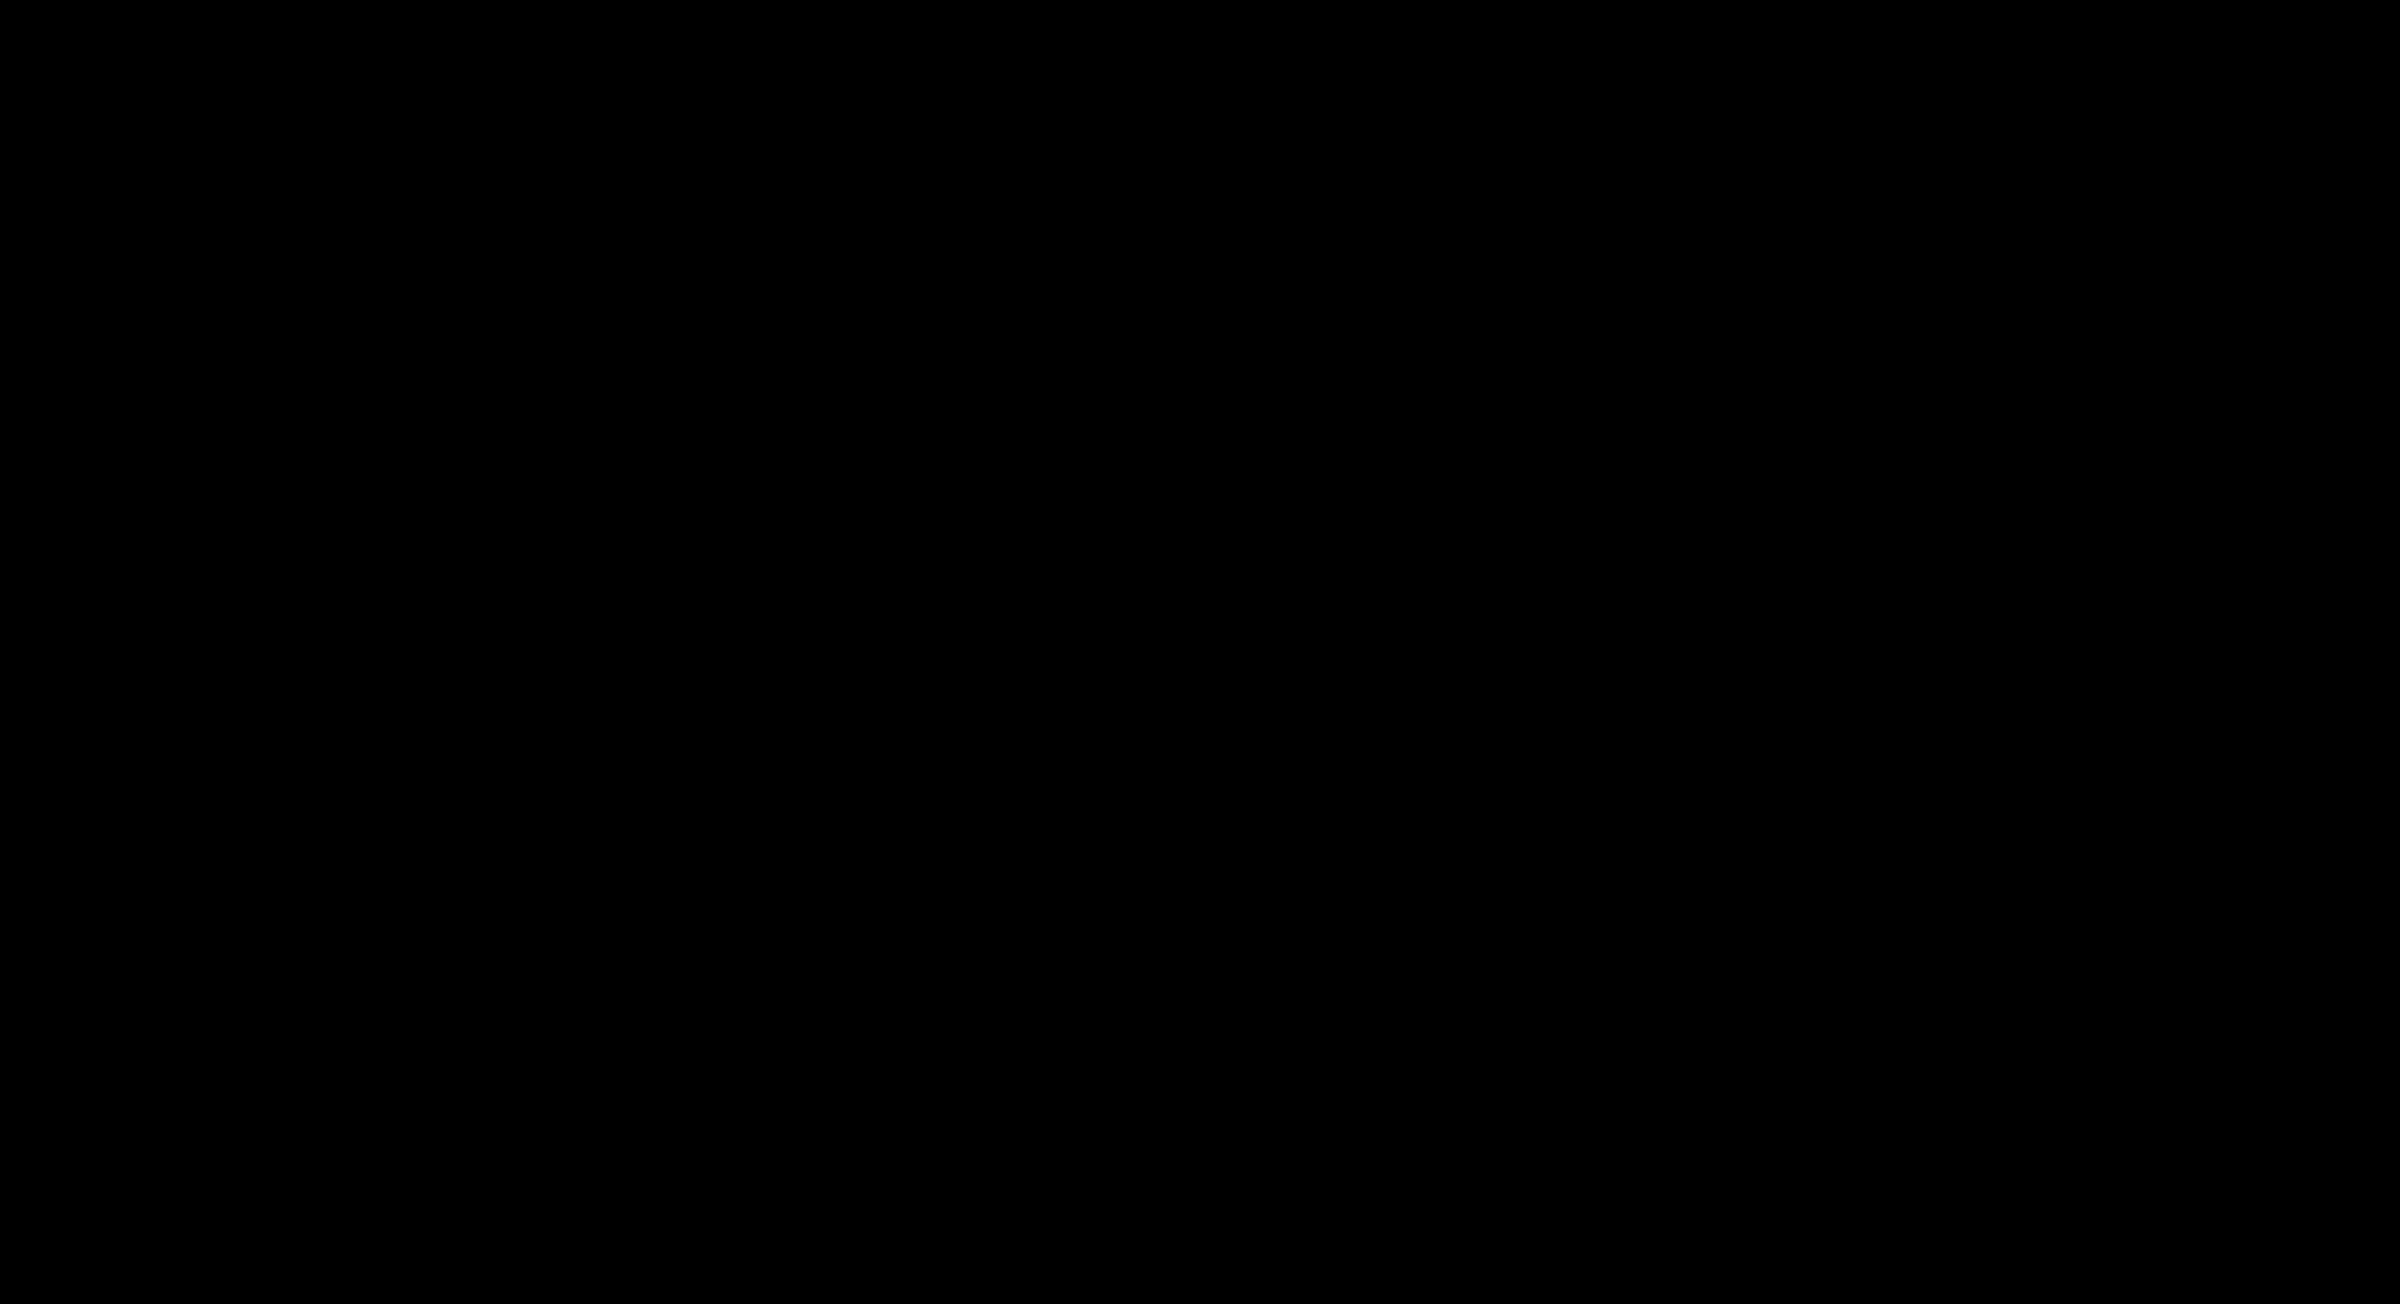 2400x1304 Clipart